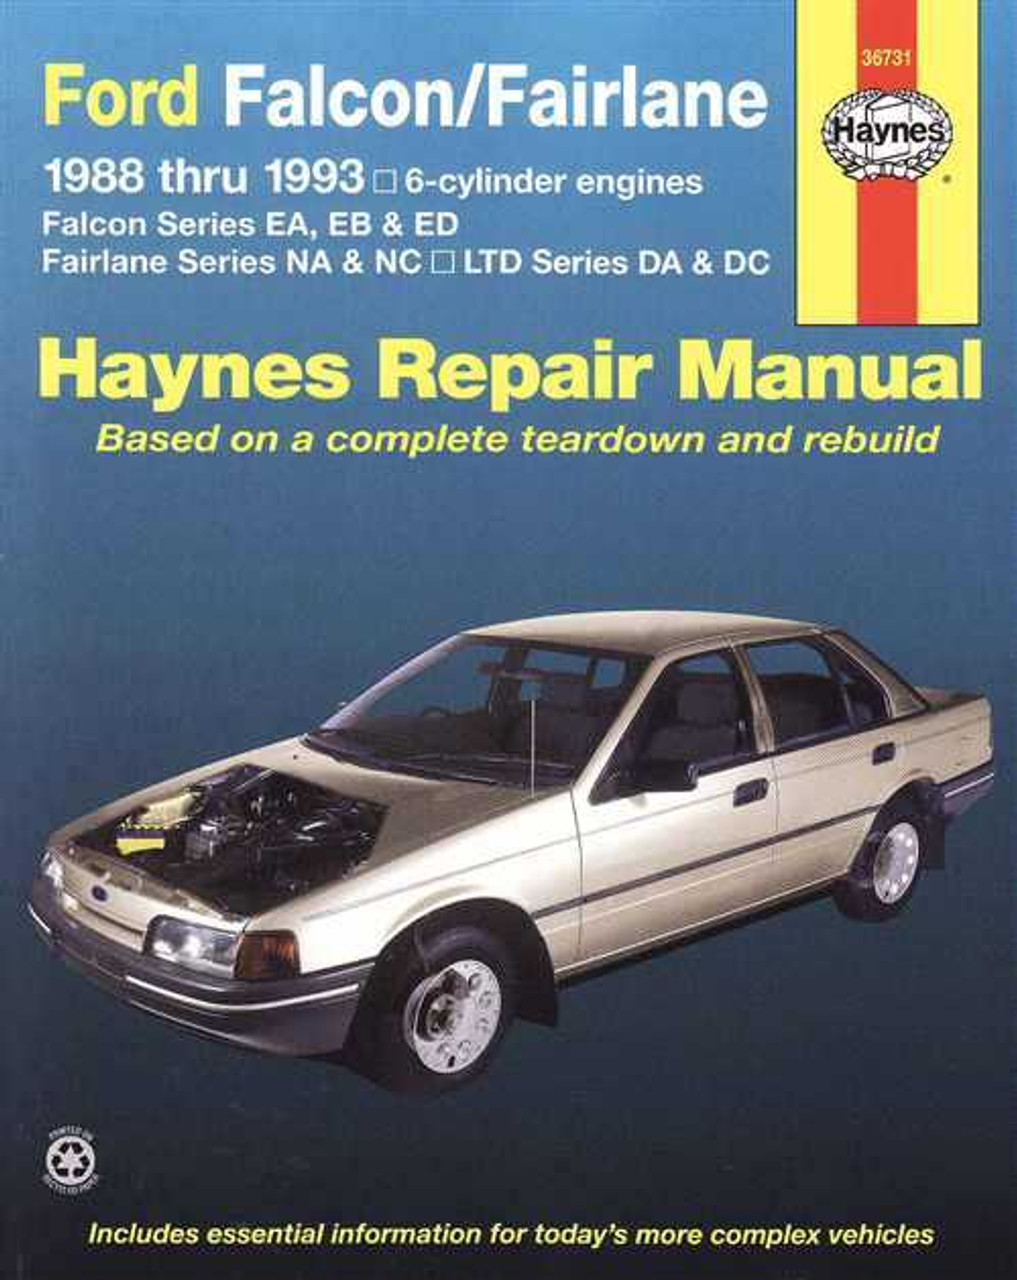 ford falcon fairlane 1988 1993 workshop manual rh automotobookshop com au ford nc fairlane workshop manual ford nc fairlane workshop manual